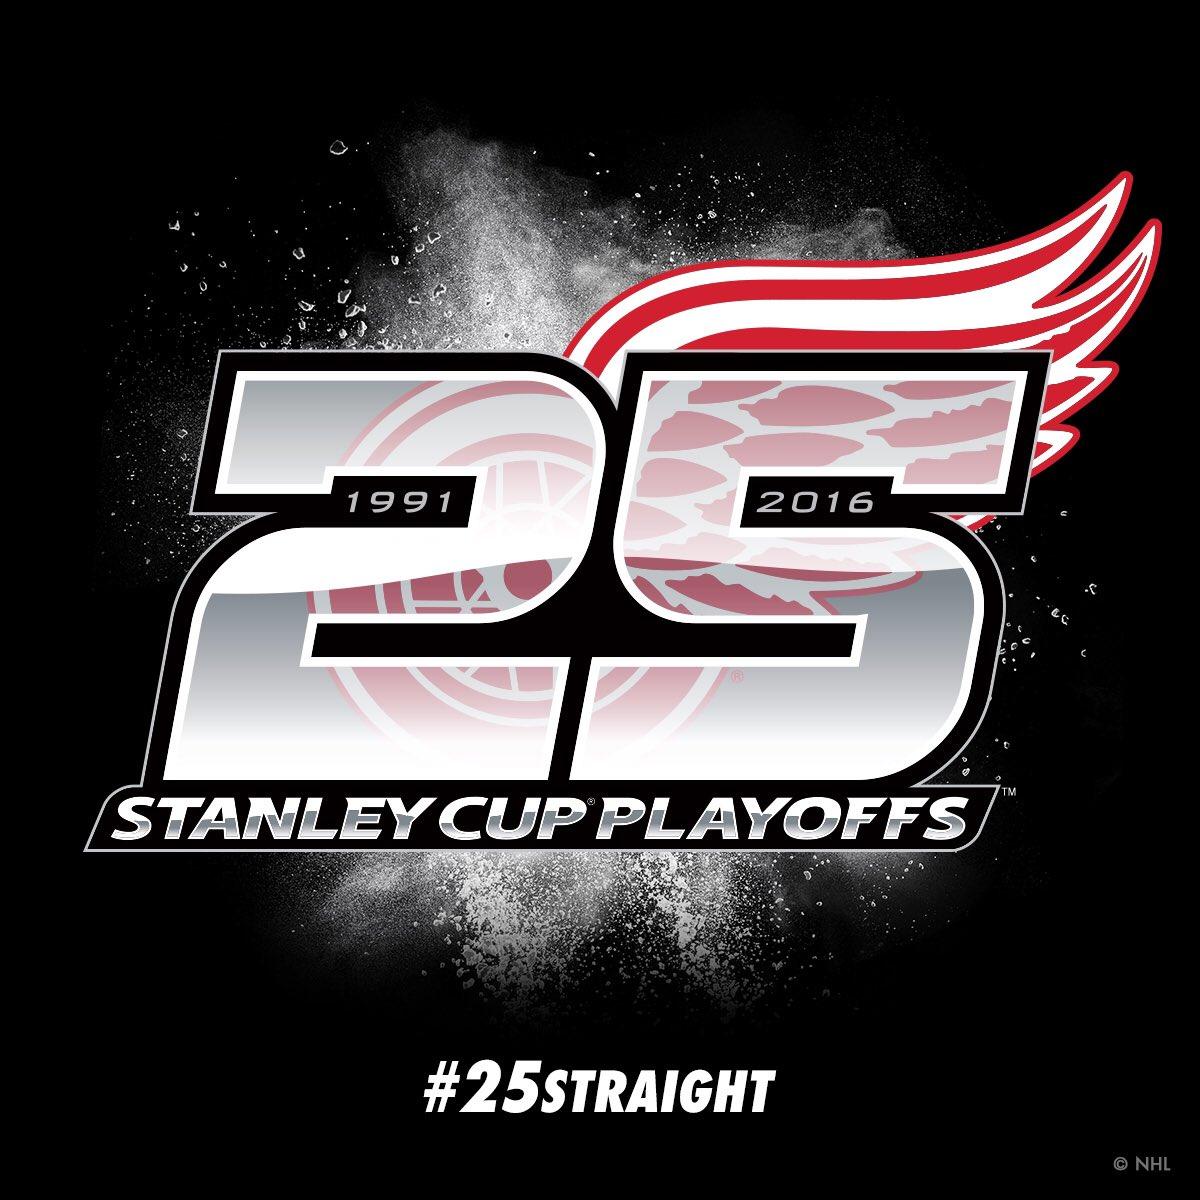 #25TheHardWay | #25Straight